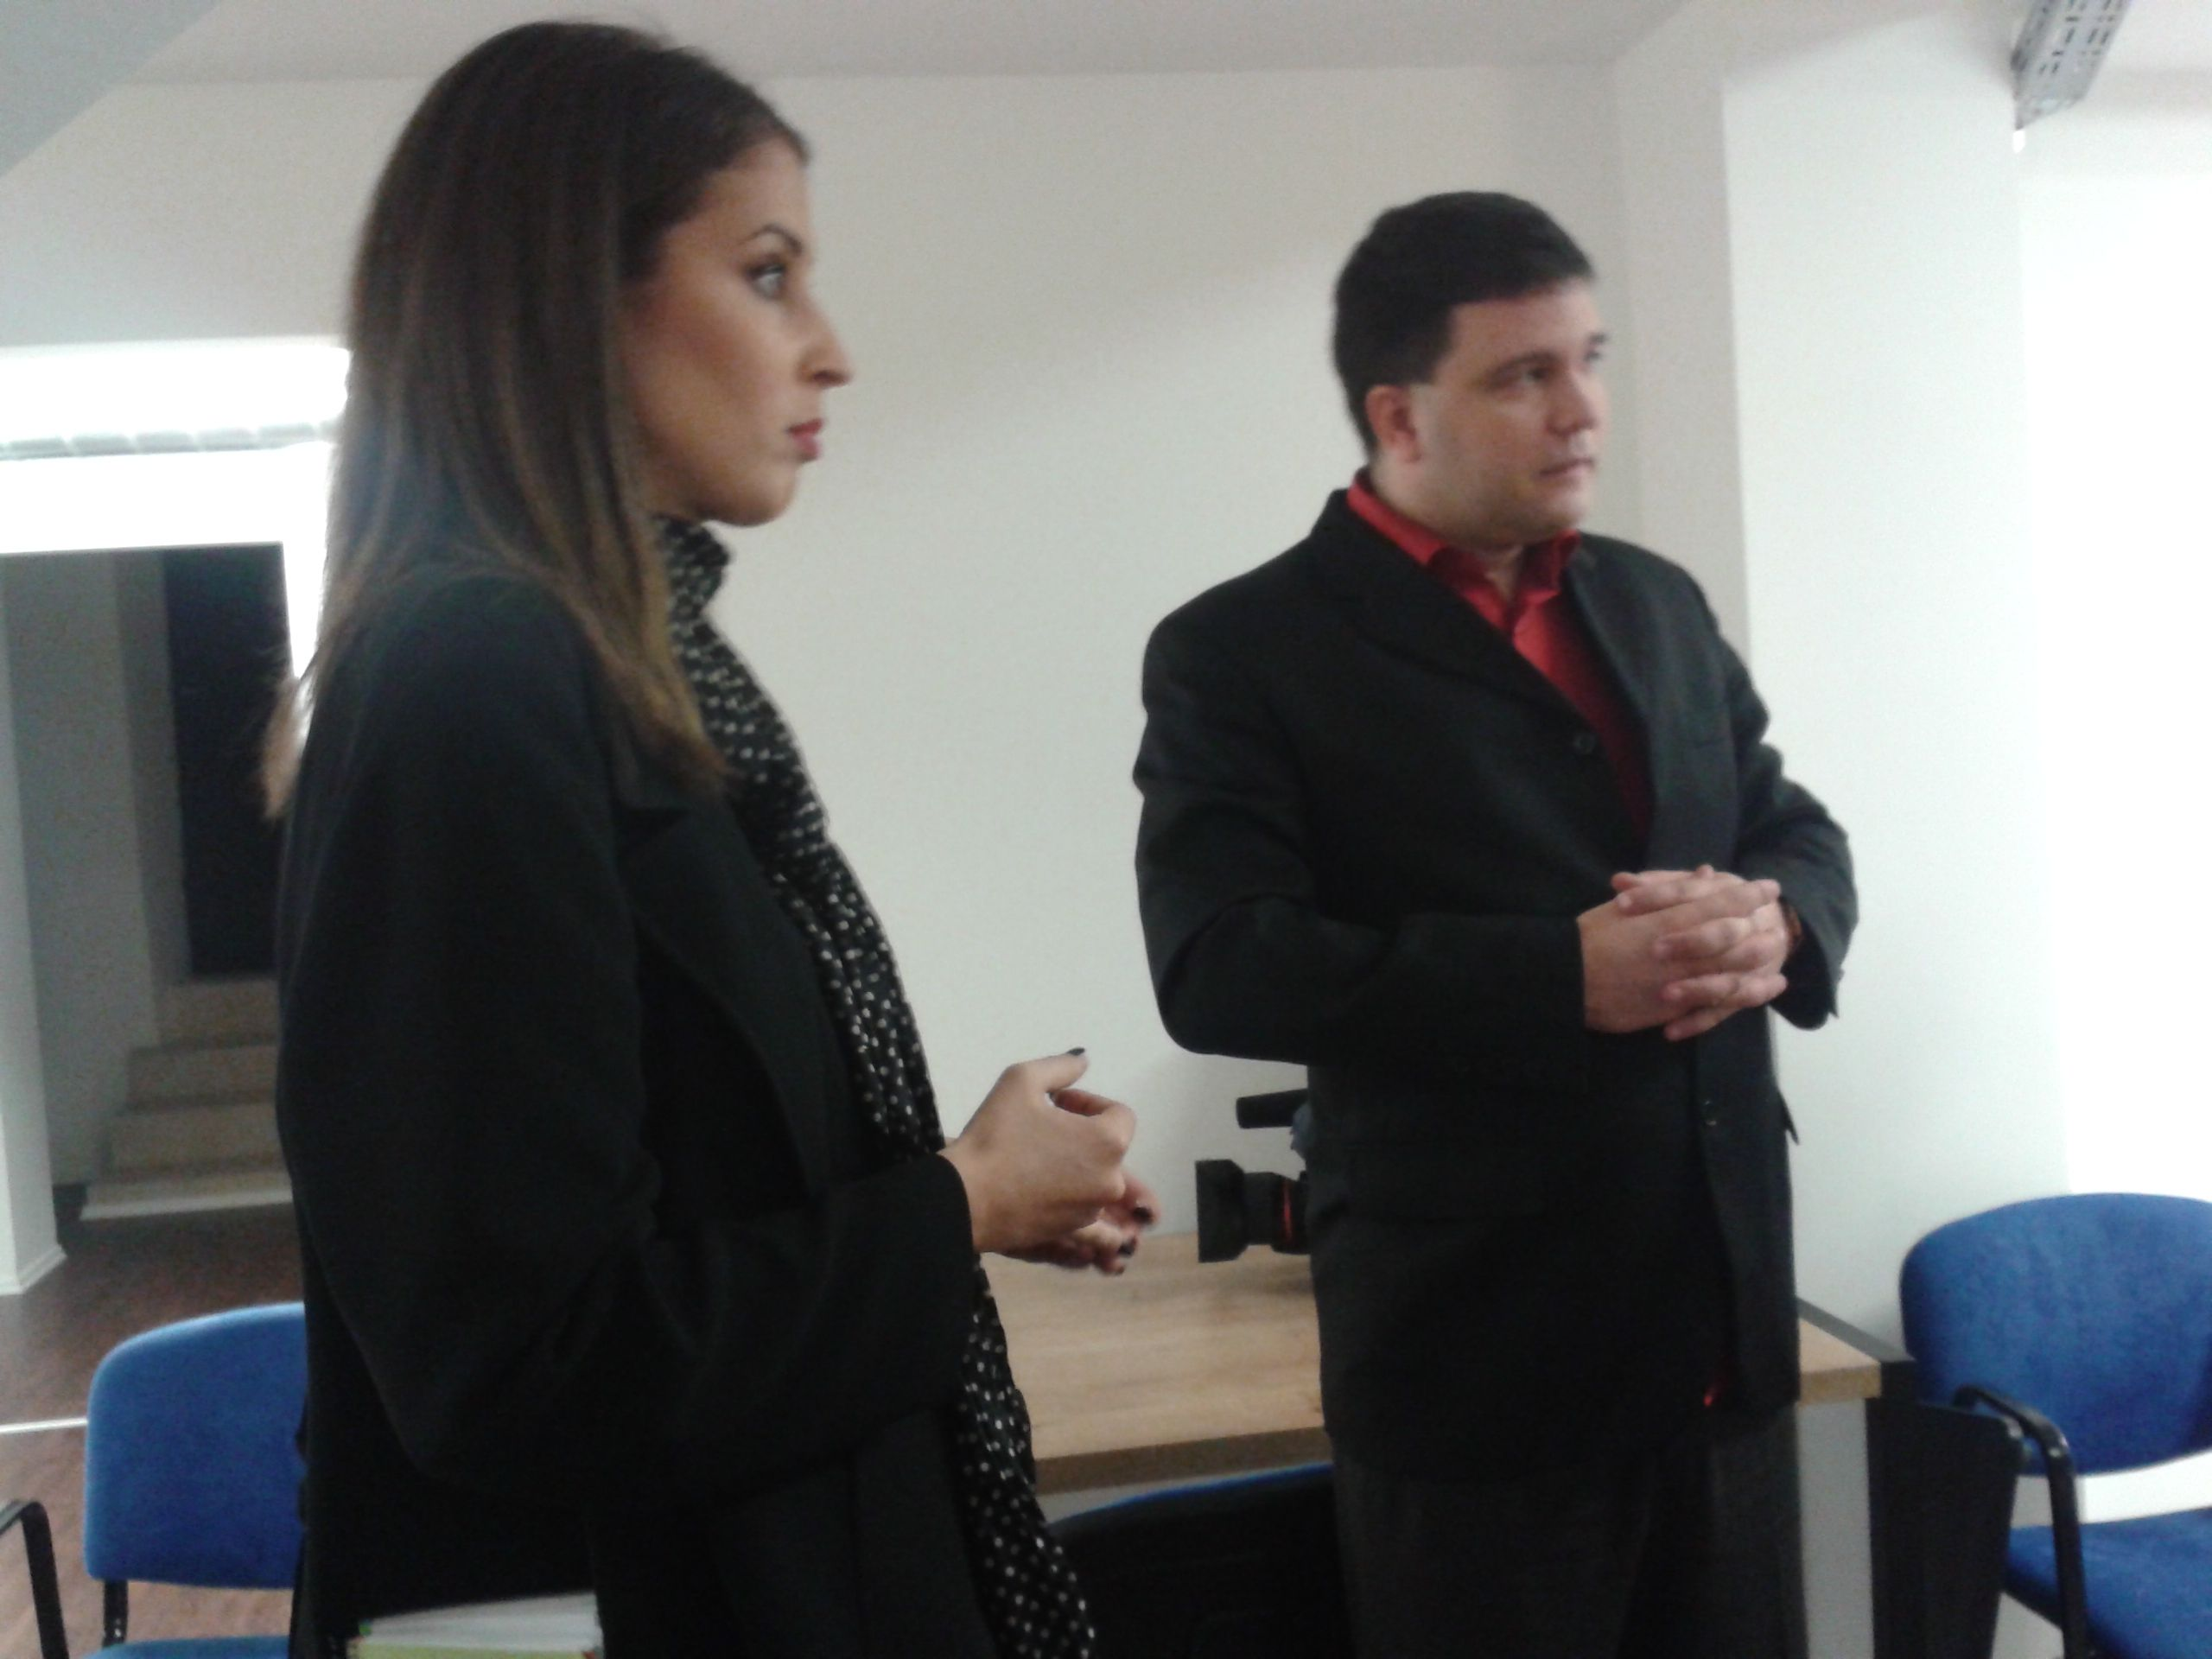 executive assistant bsn ivana marjanovi and head